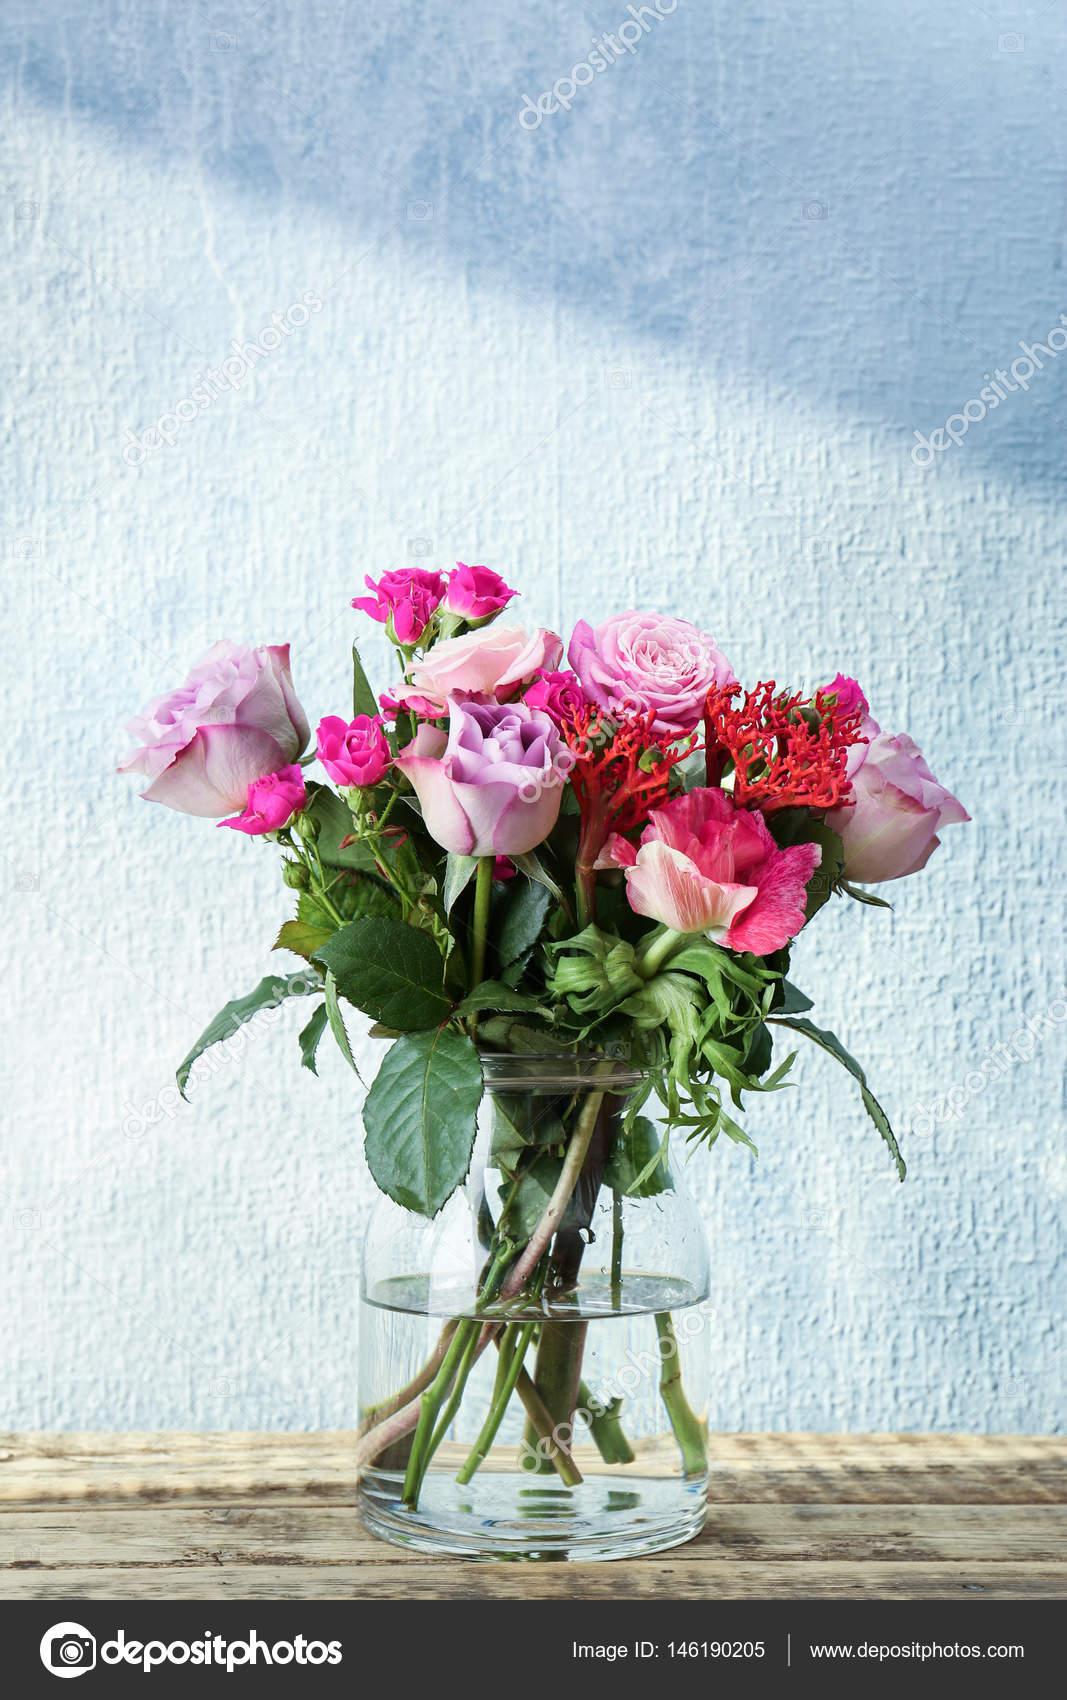 Mazzo Di Fiori In Vaso.Glass Vase With Beautiful Bouquet Of Flowers Stock Photo